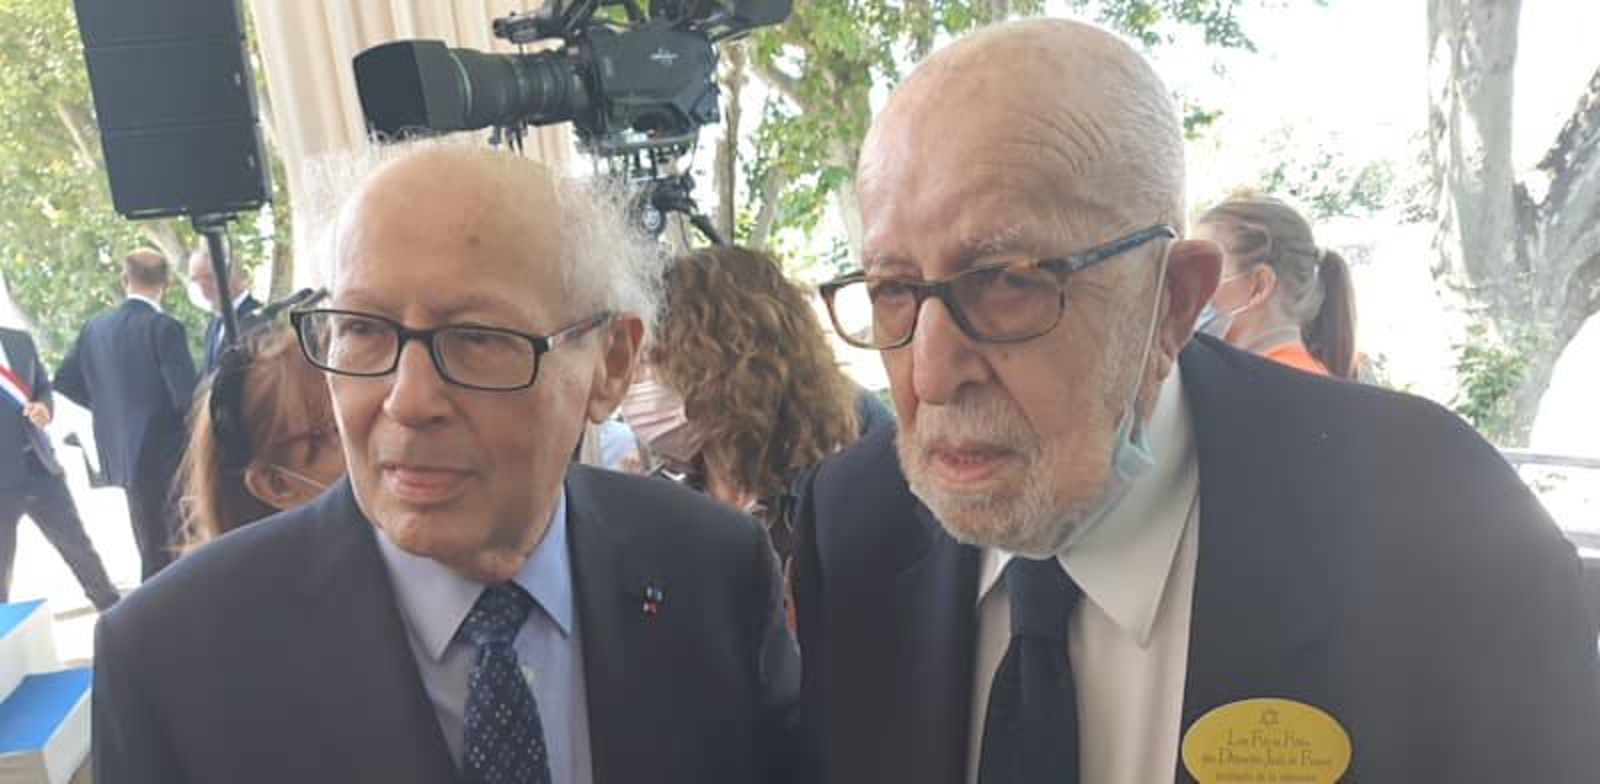 Serge Klarsfeld, with Joseph Schwartz credit: BK